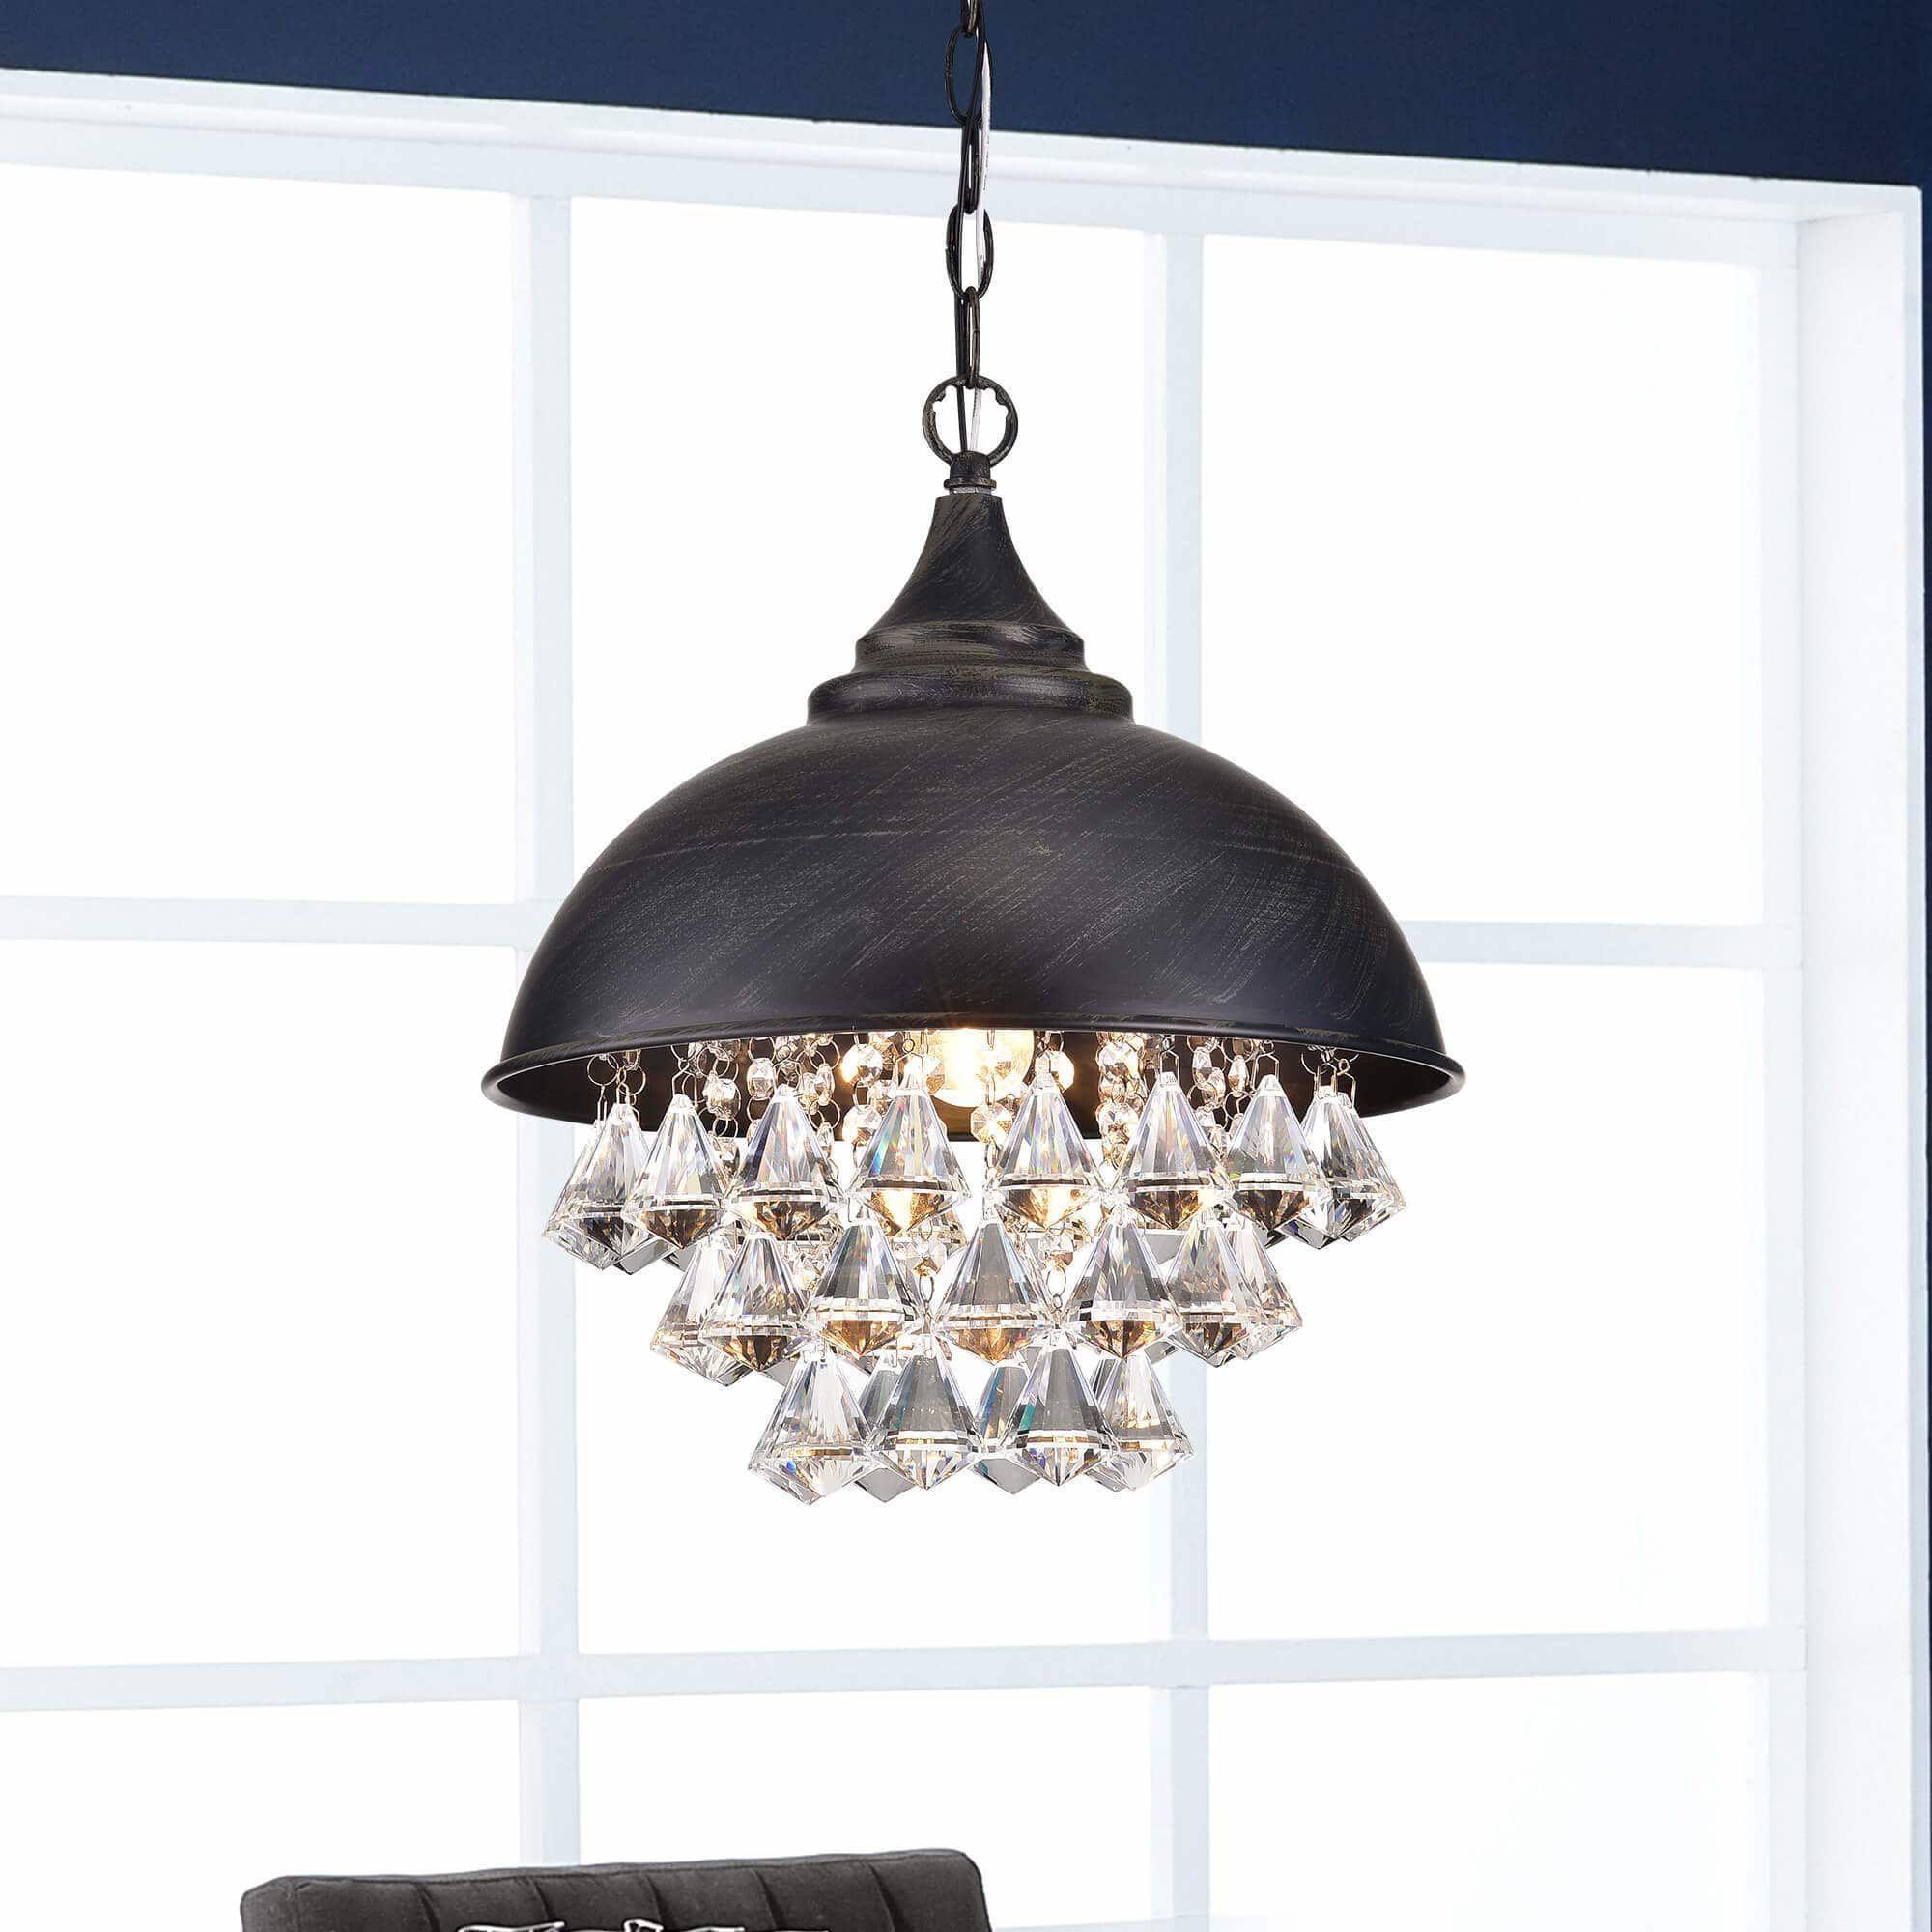 Visalia Antique Black Single Light Crystal Chandelier within Monadnock 1-Light Single Dome Pendants (Image 30 of 30)